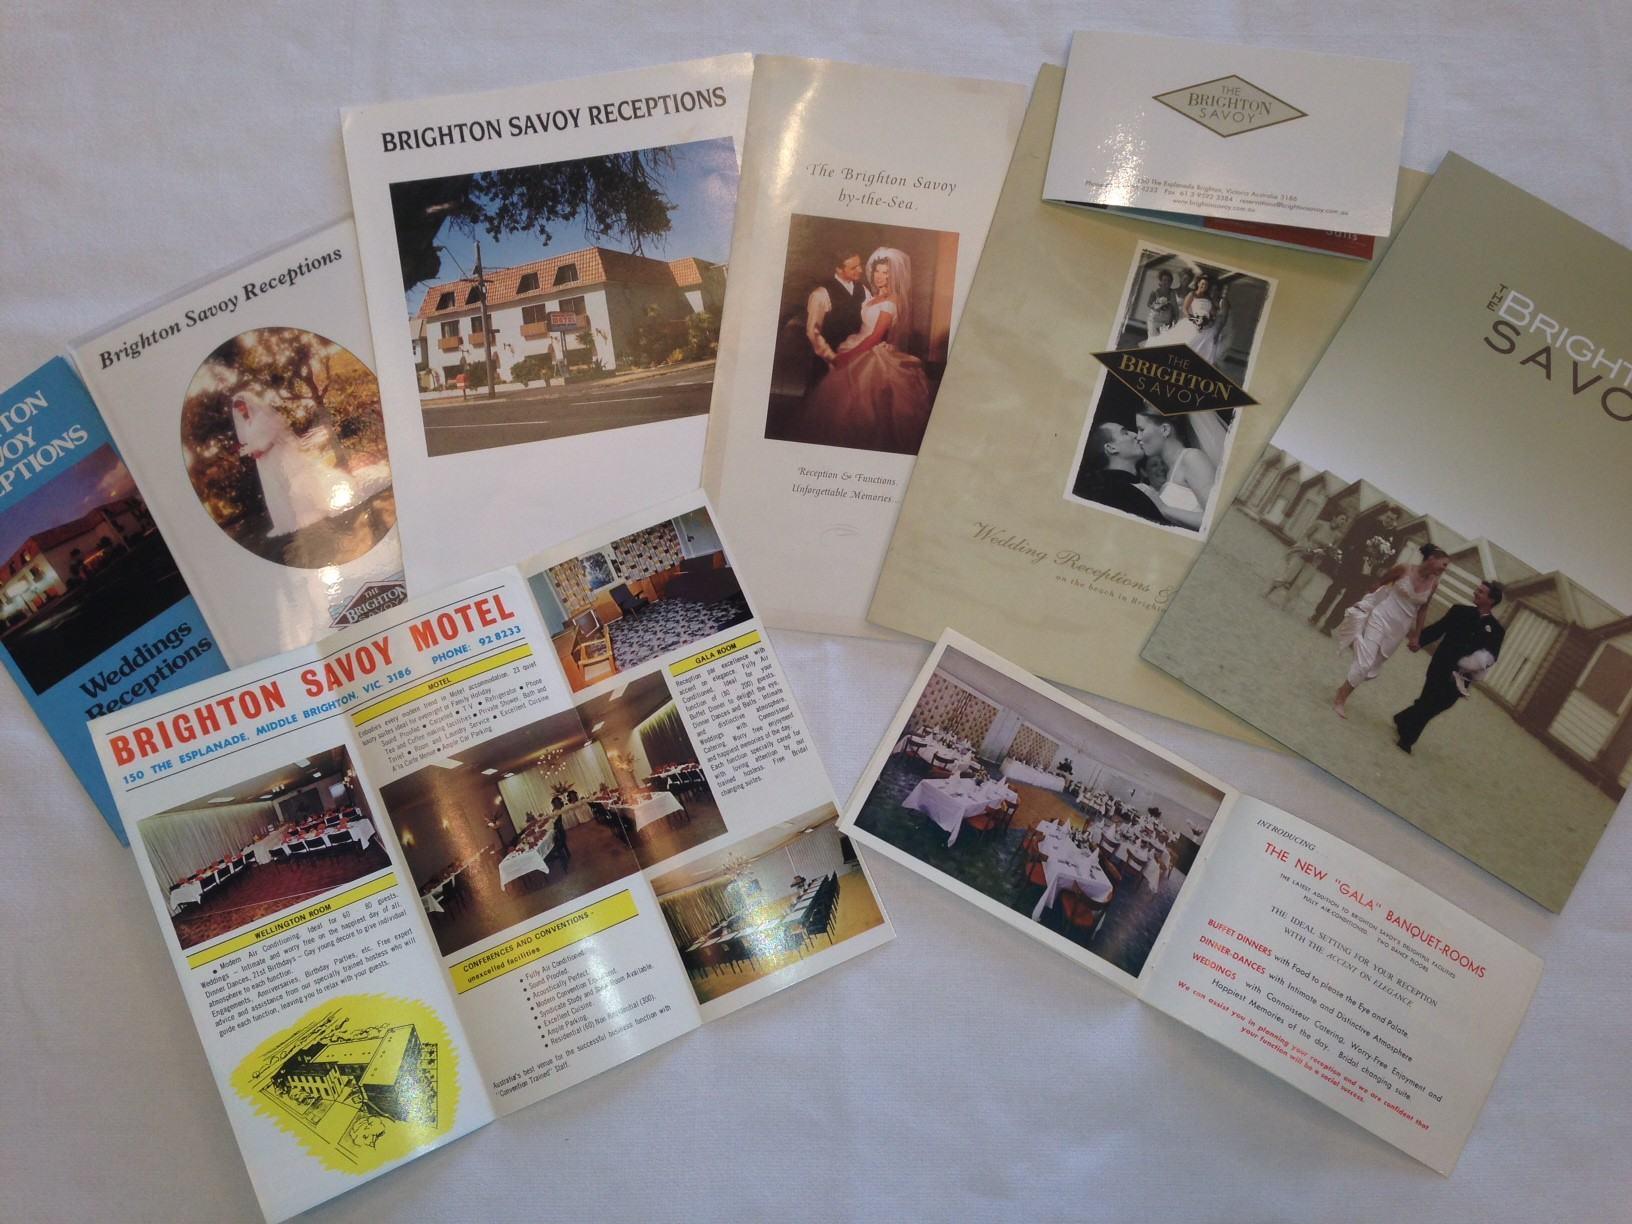 Photo of historical Brighton Savoy wedding reception brochures